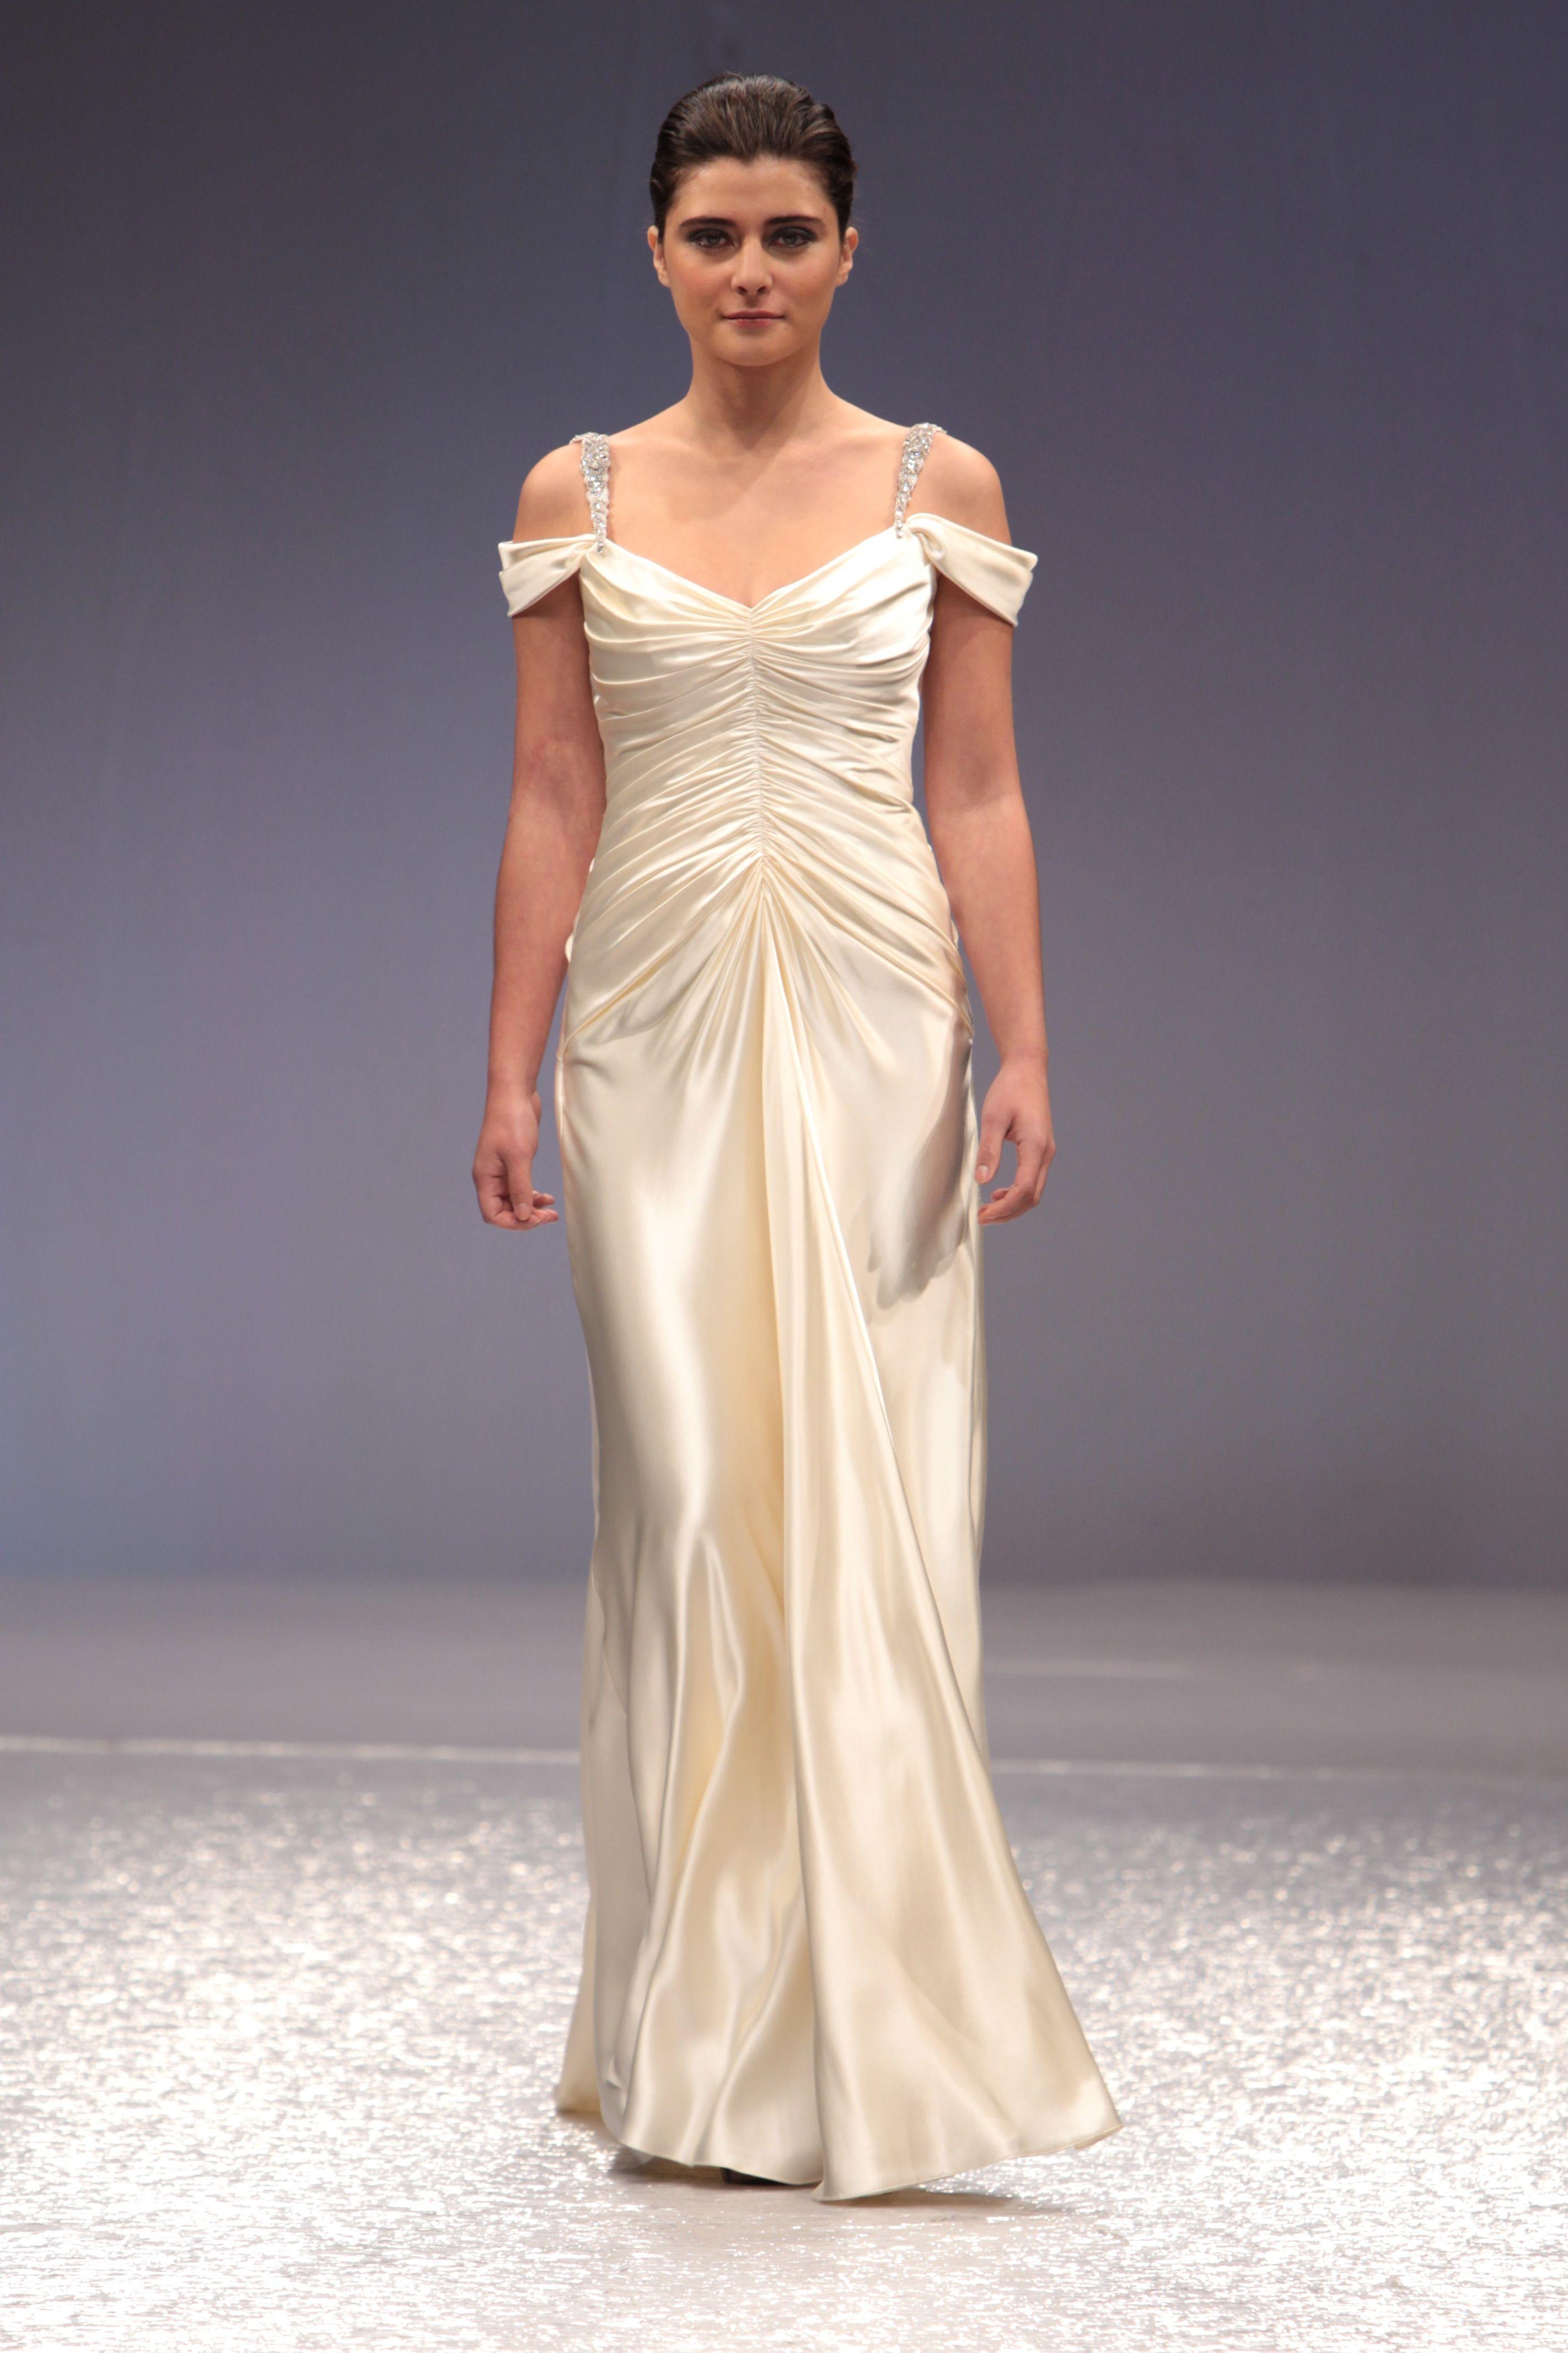 Gold wedding dresses wedding dresses and fashion ideas